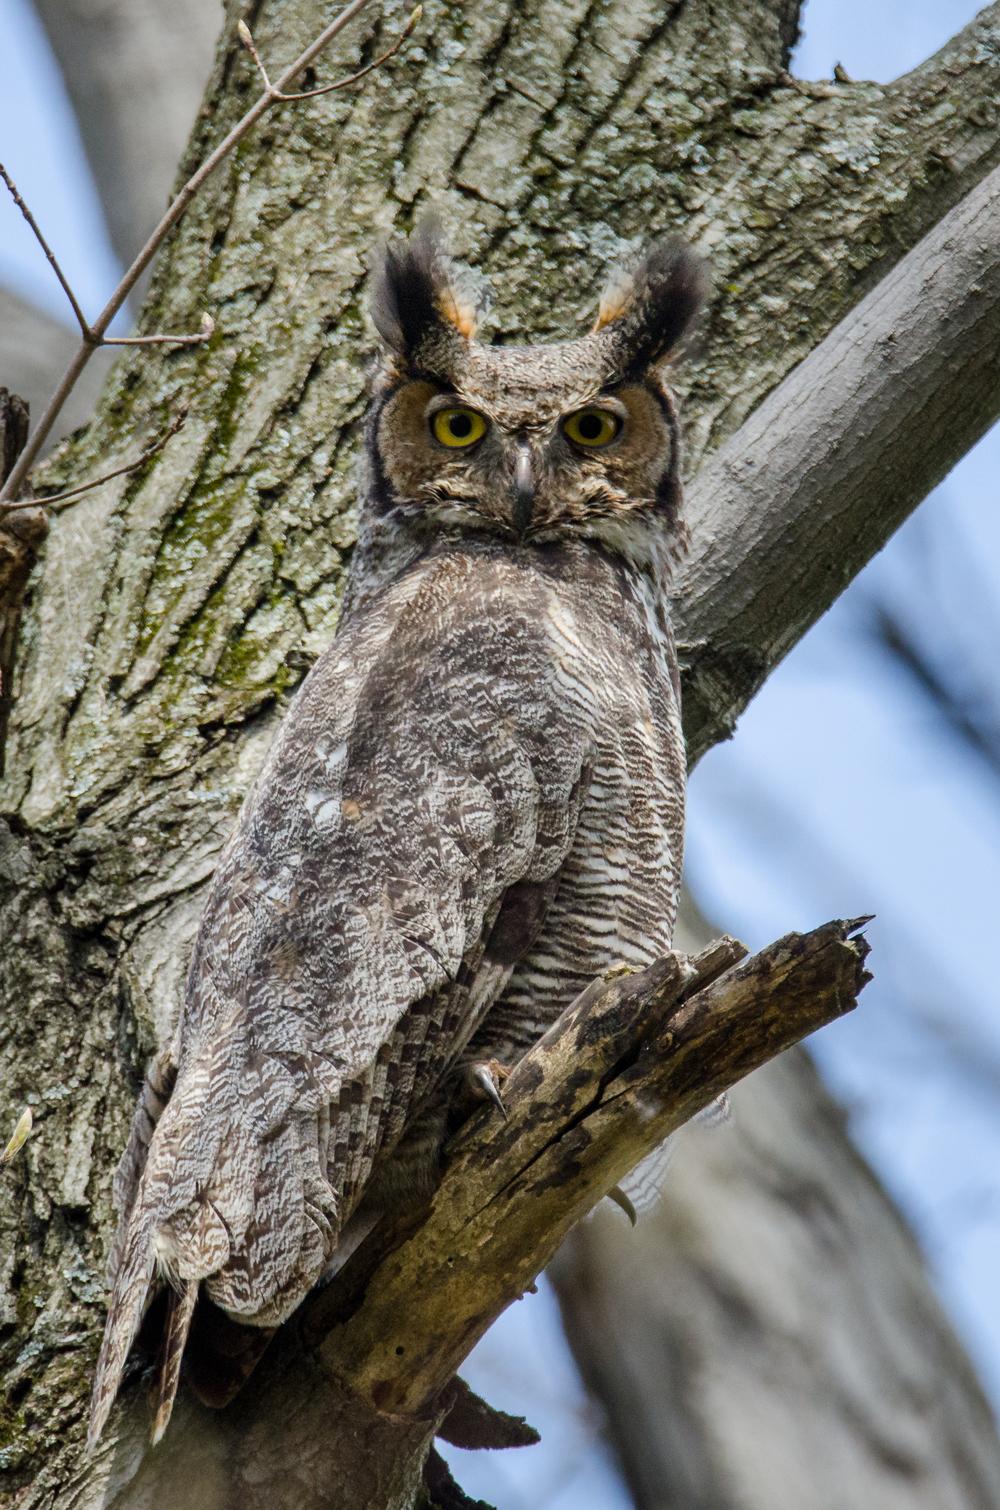 Male  Great Horned Owl  Nikon D7000 ISO 800 550mm f/10 1/640 sec